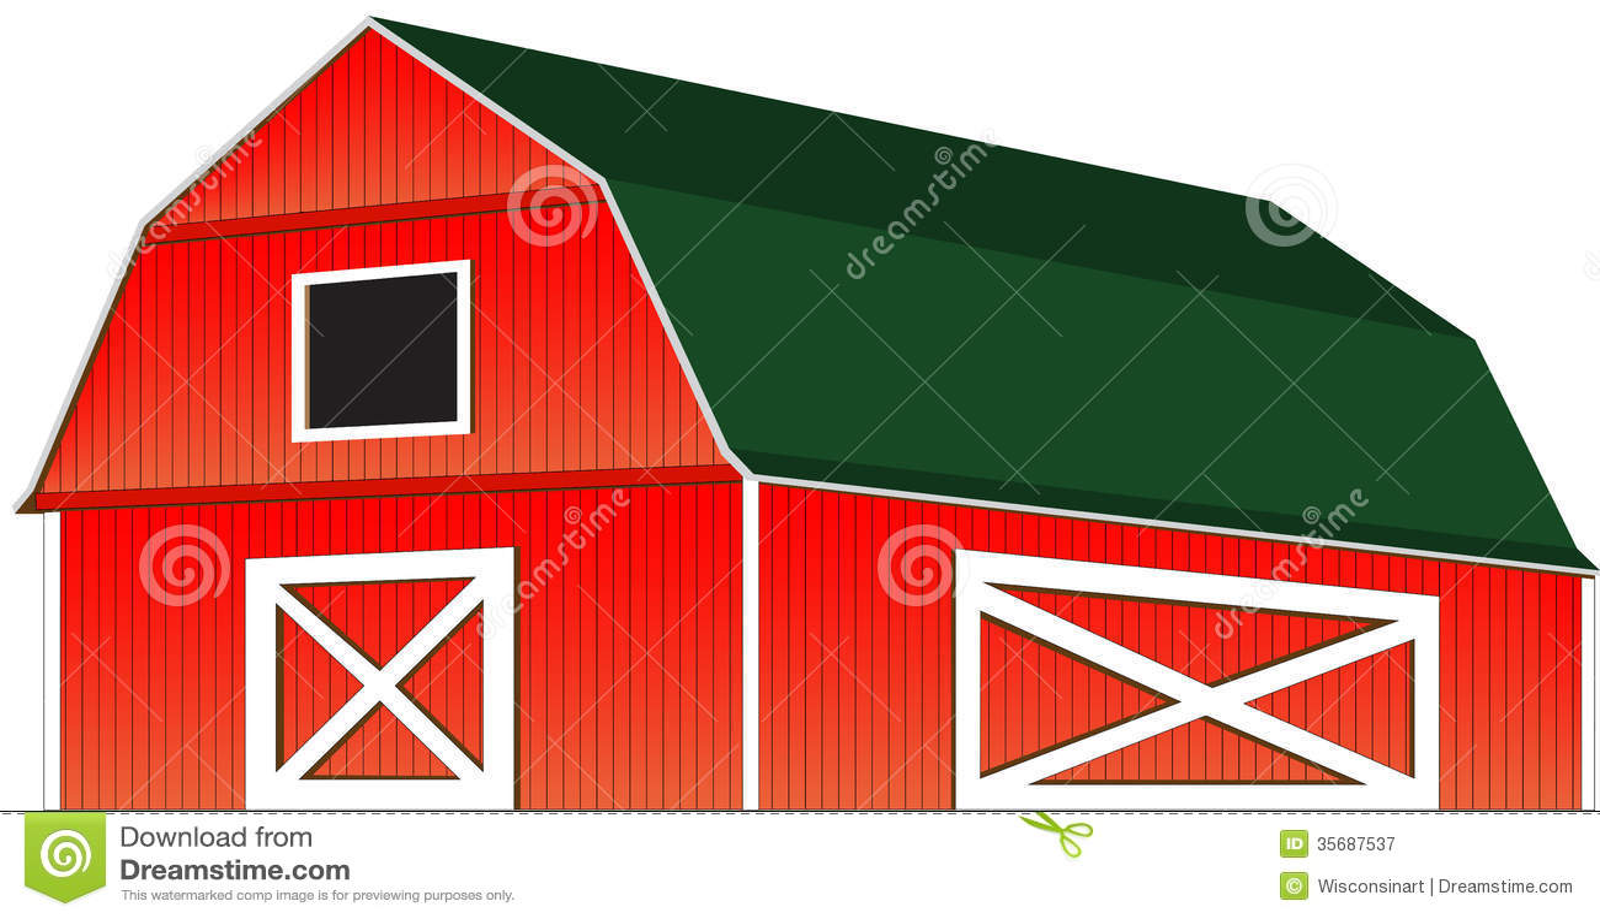 Farm Barn red farm barn vector illustration isolated royalty free stock